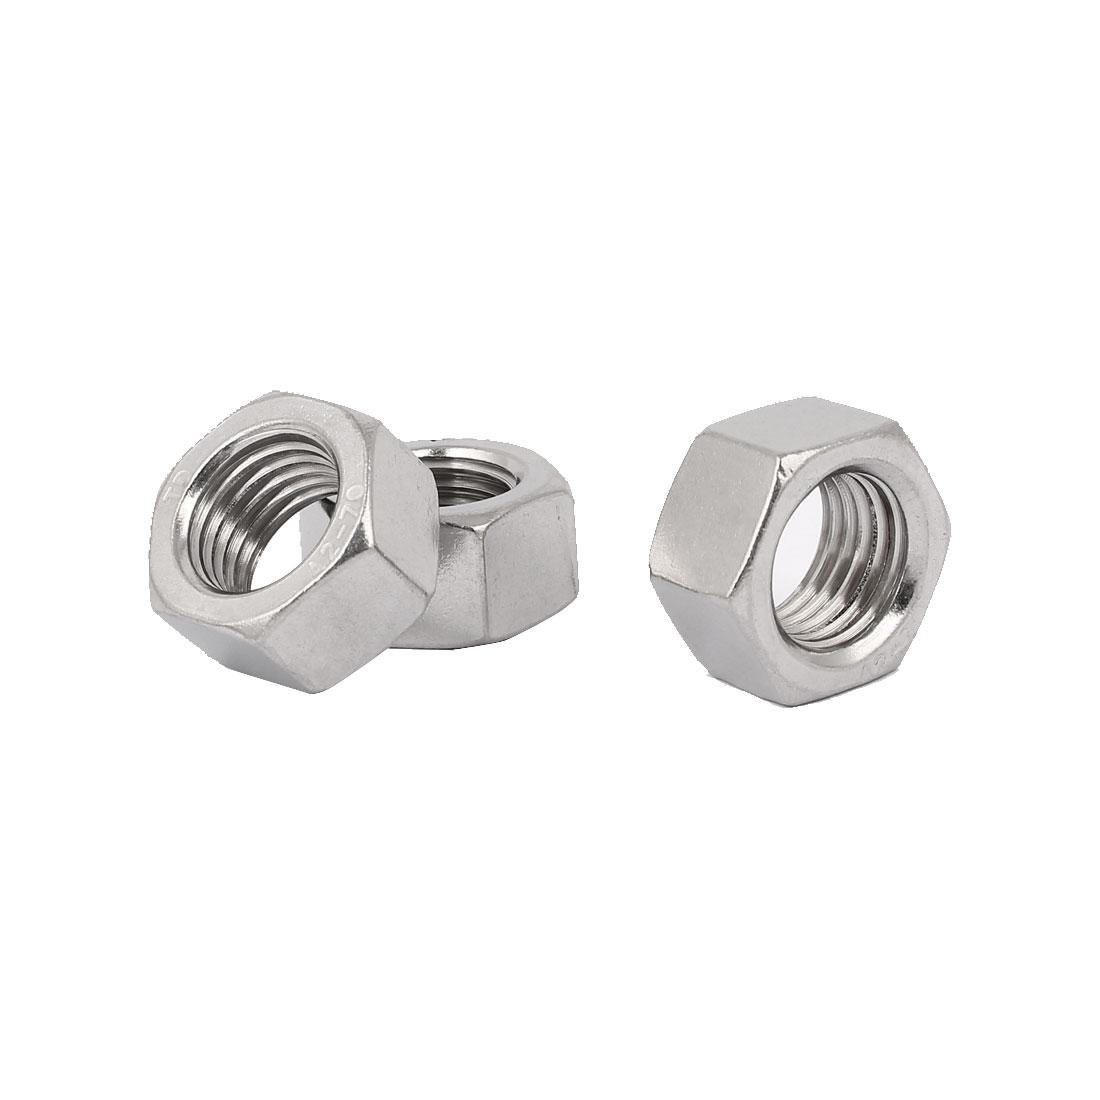 M22 Thread Dia 304 Stainless Steel Hex Nut Screw Cap Fastener Silver Tone 3pcs